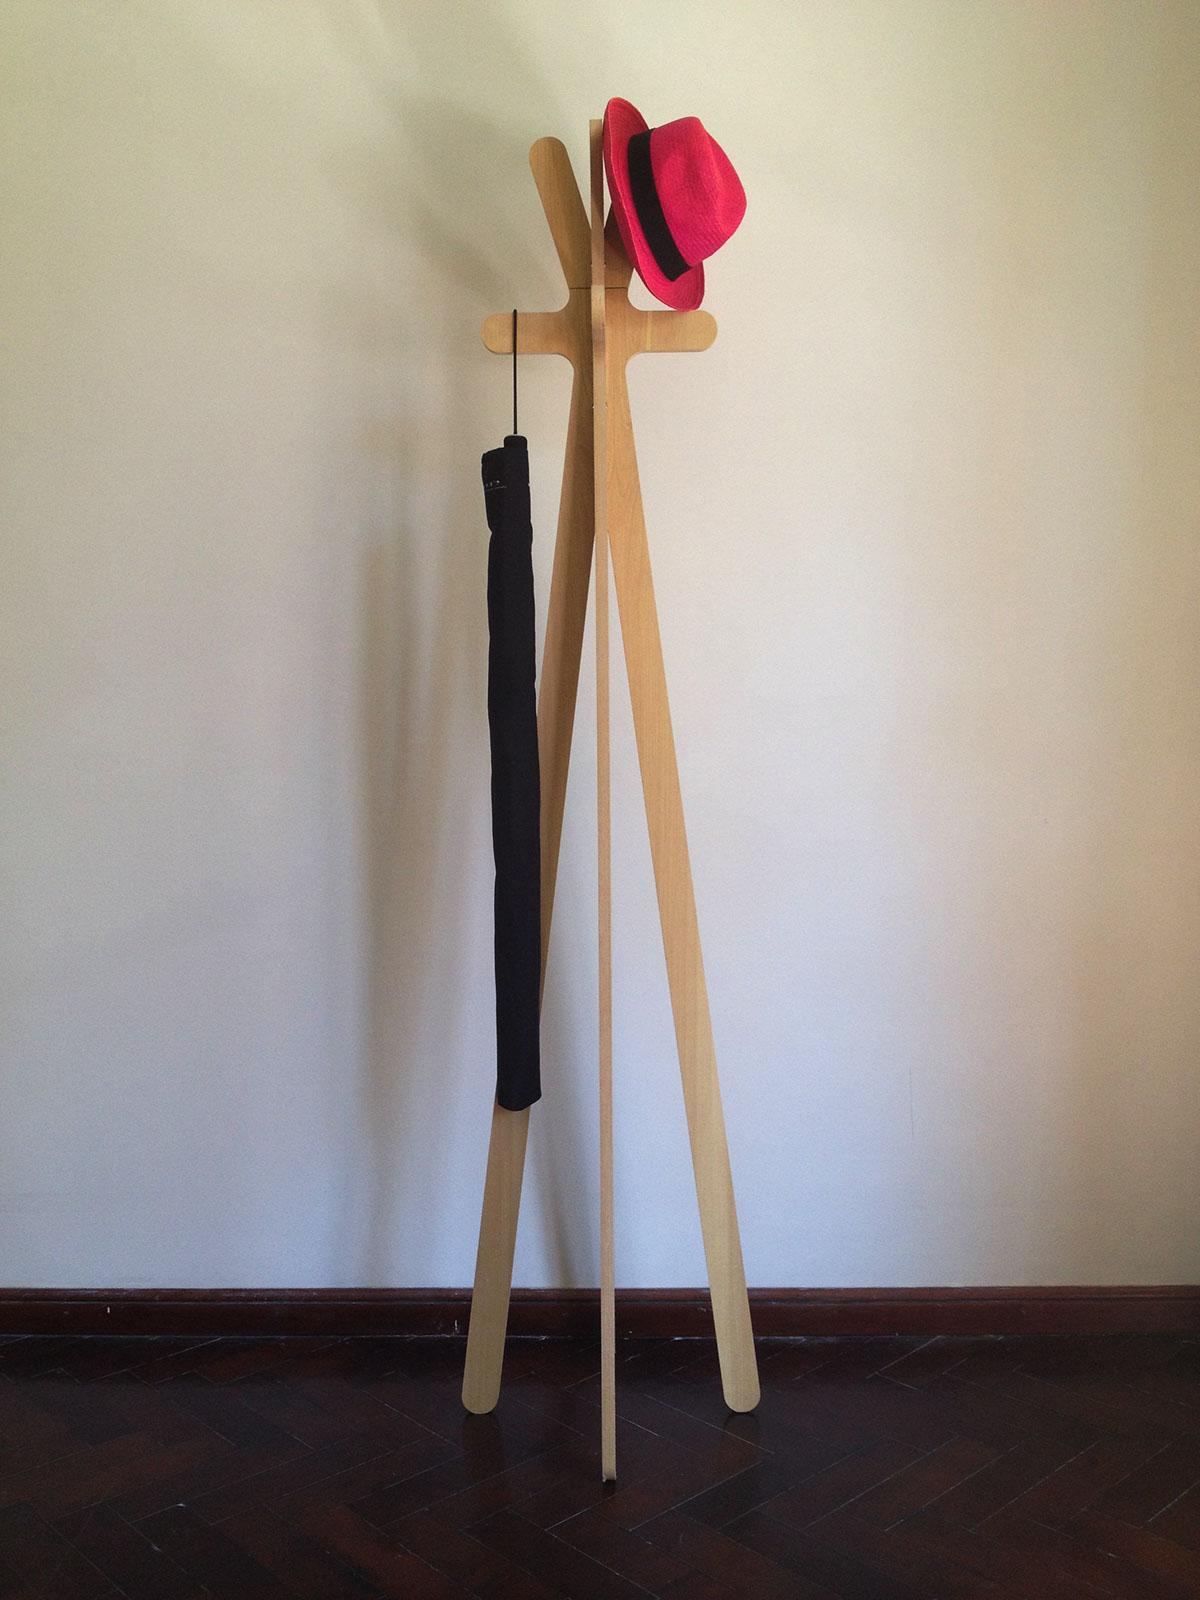 Chopstick coat hanger on behance for Coat hanger art projects